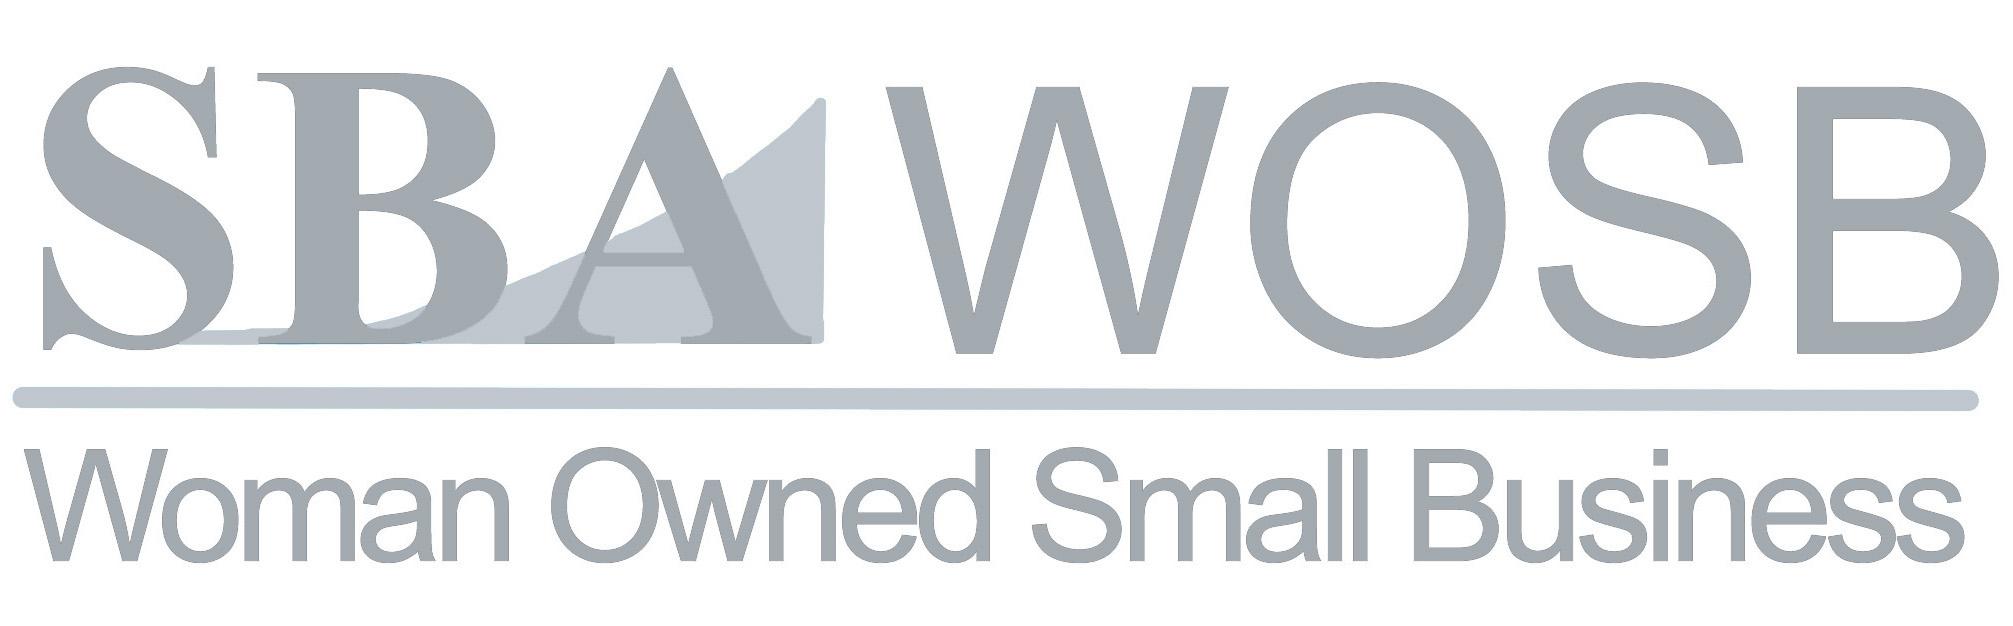 sba-wosb-logo-gray